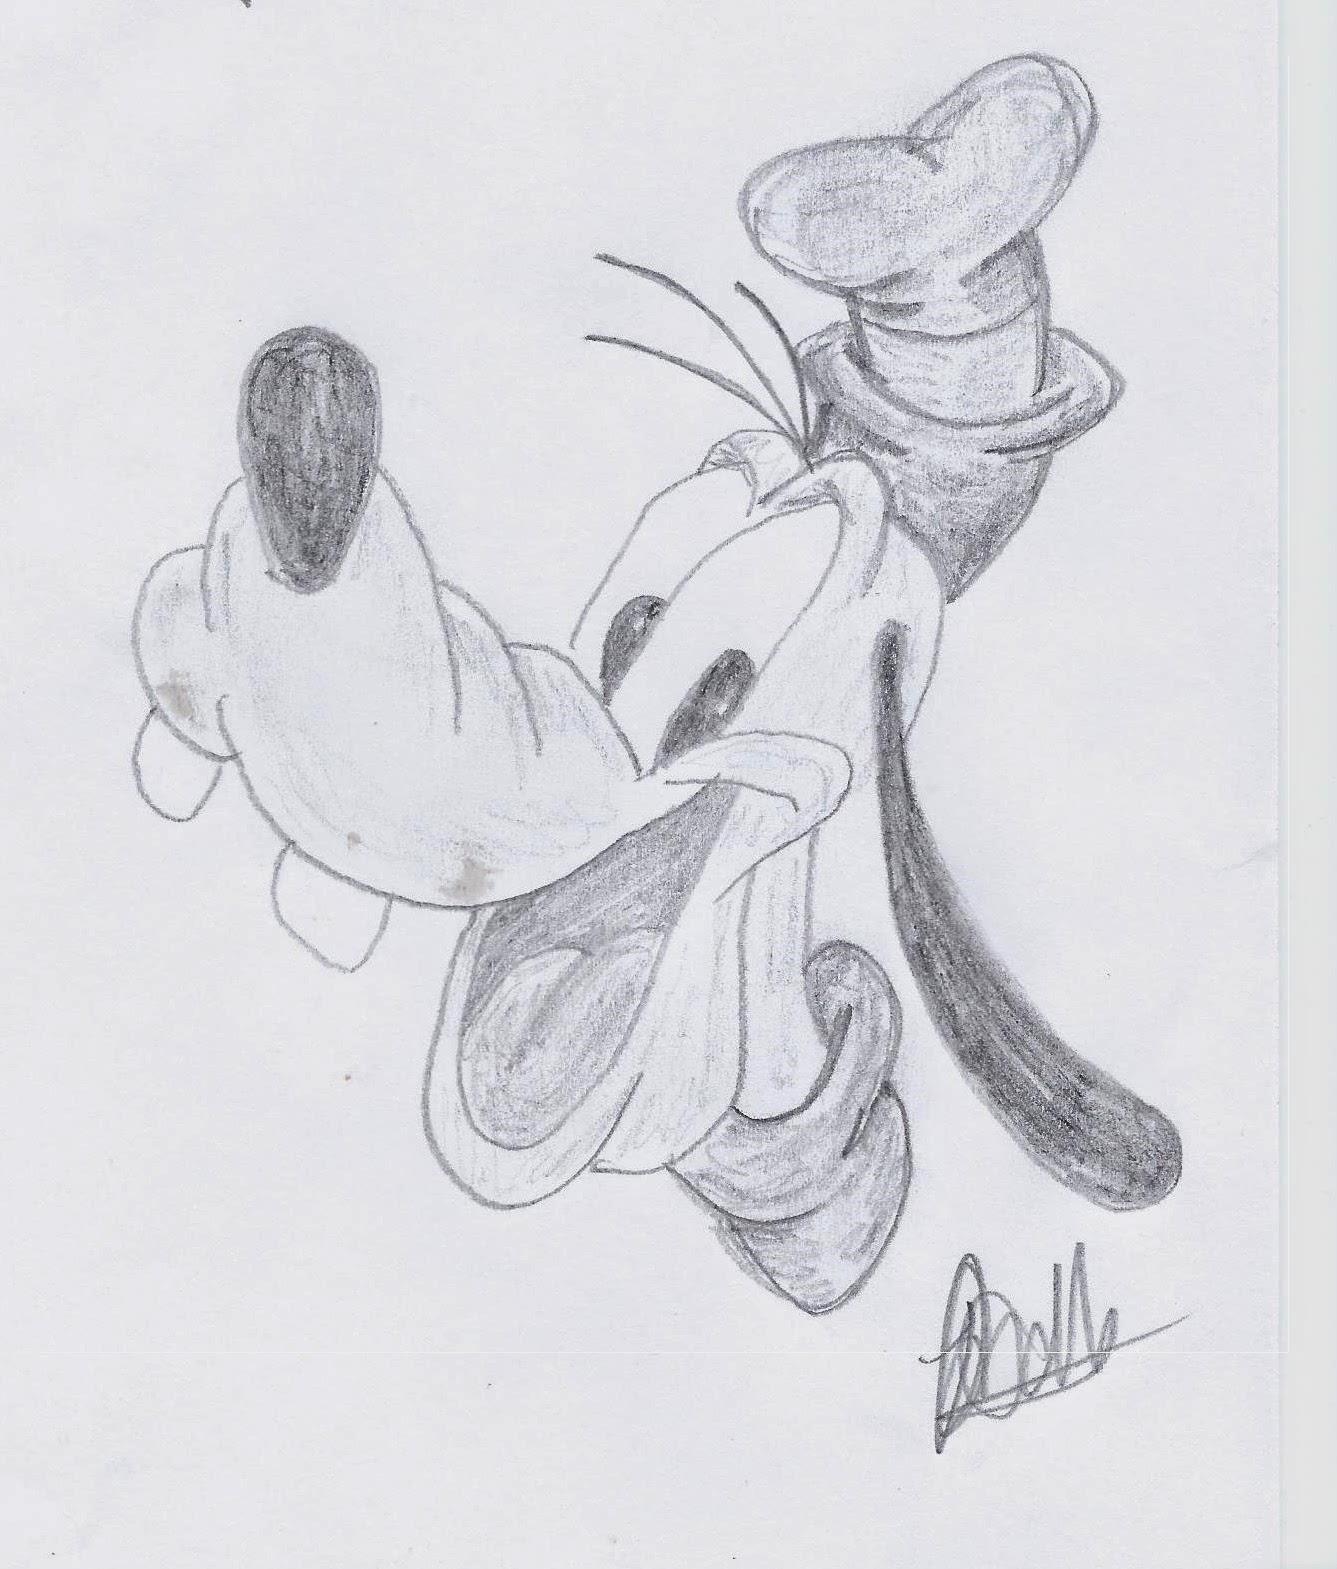 Disney Illustration Study: Classic Disney www.JoLinsdell.com, Goofy